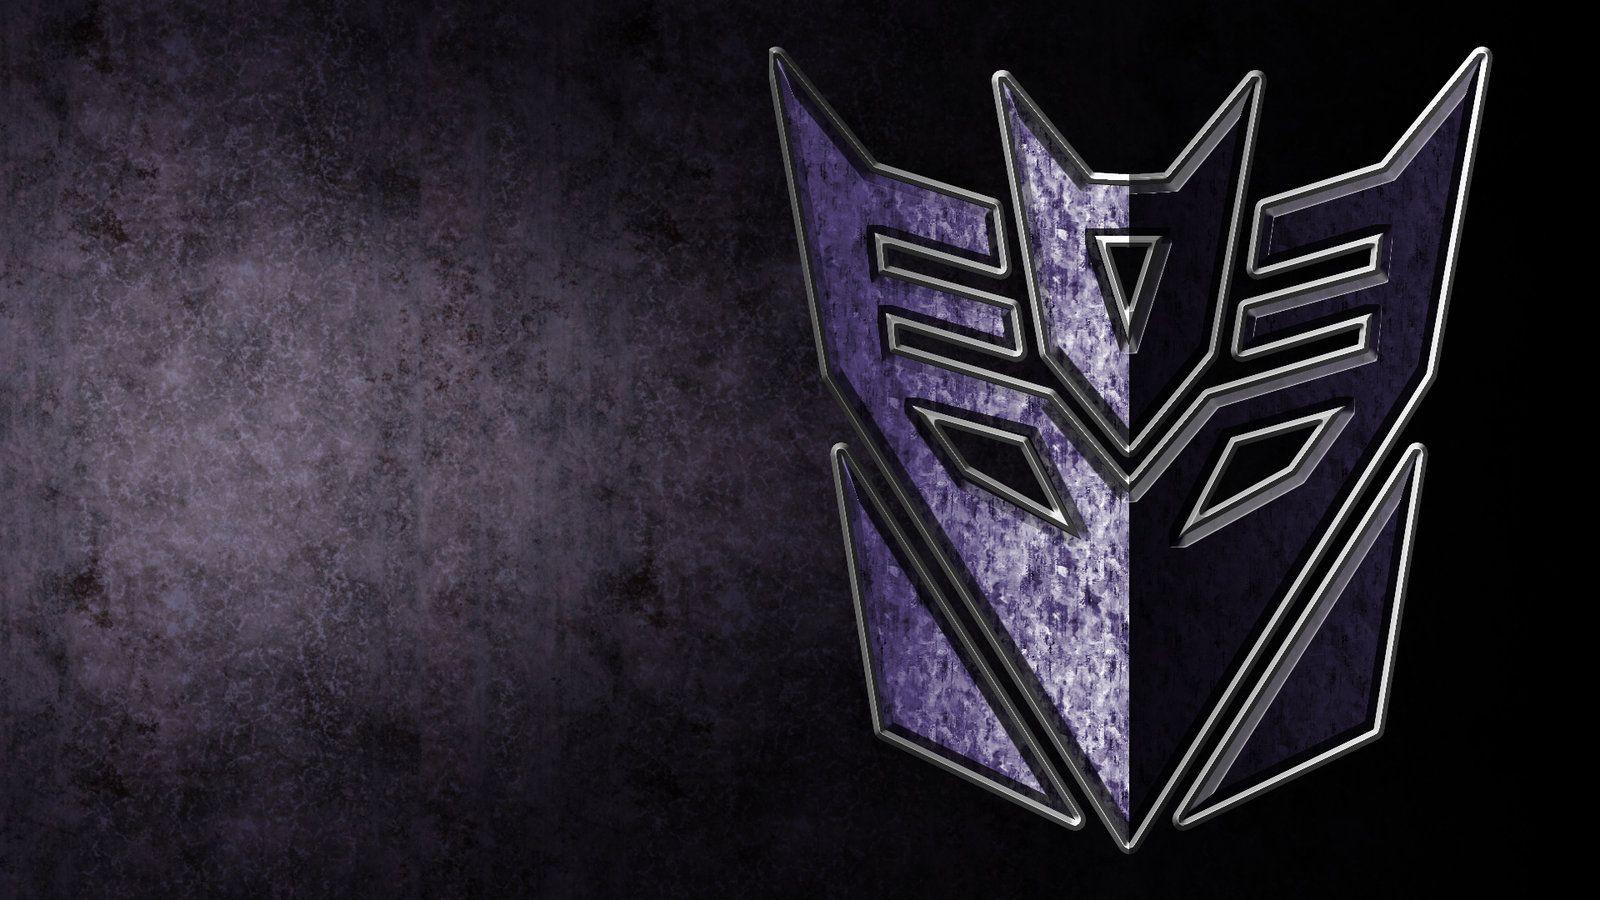 Decepticon logo | Geek | Pinterest